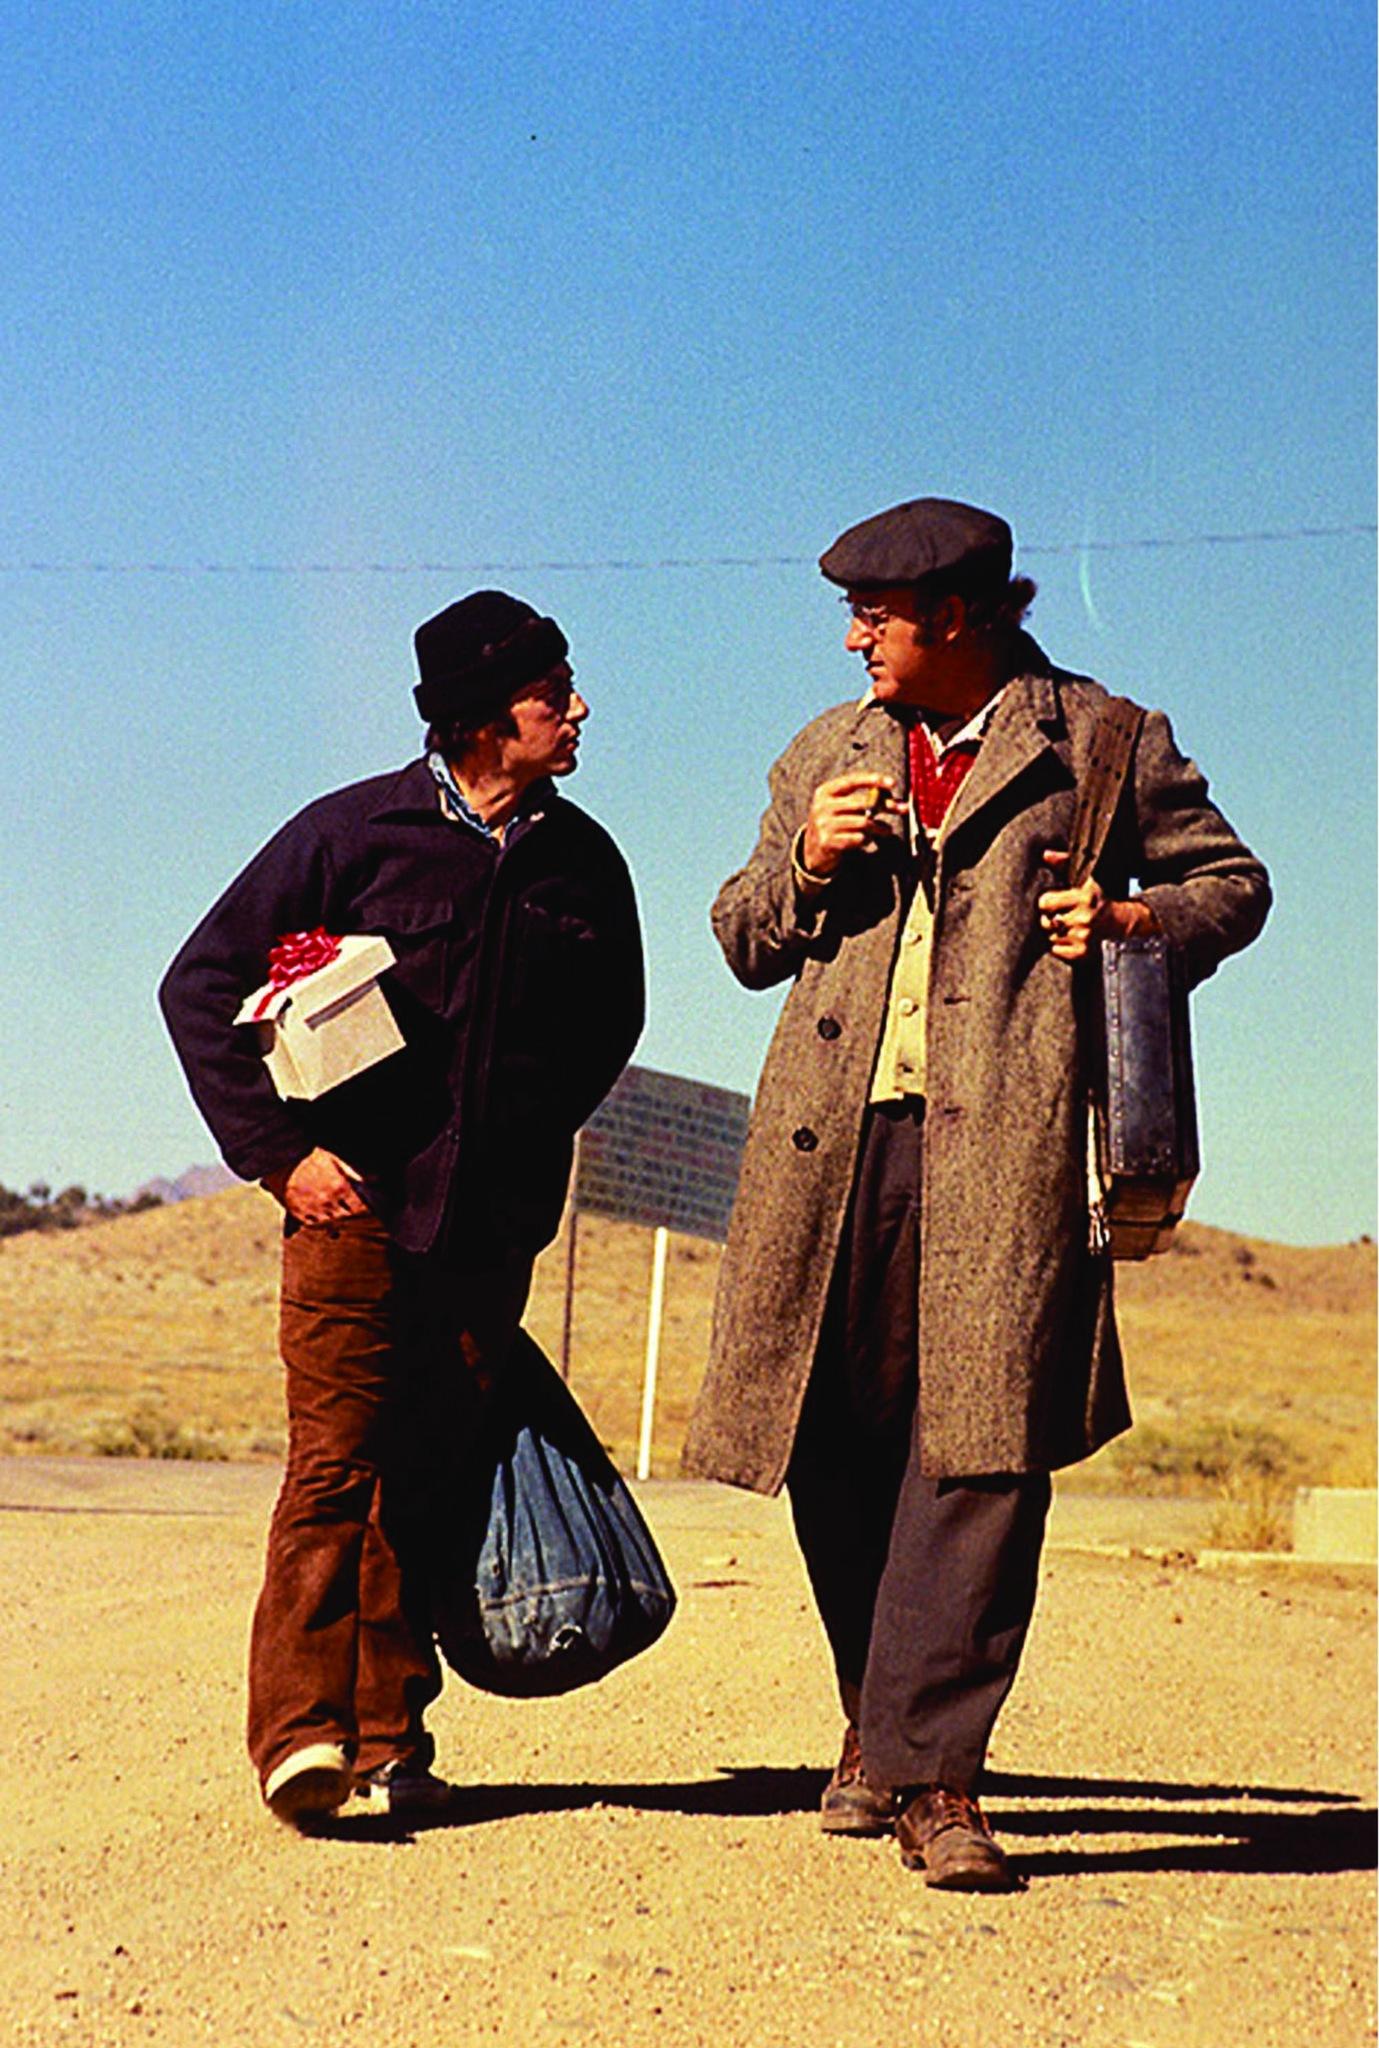 Al Pacino and Gene Hackman in Scarecrow (1973)